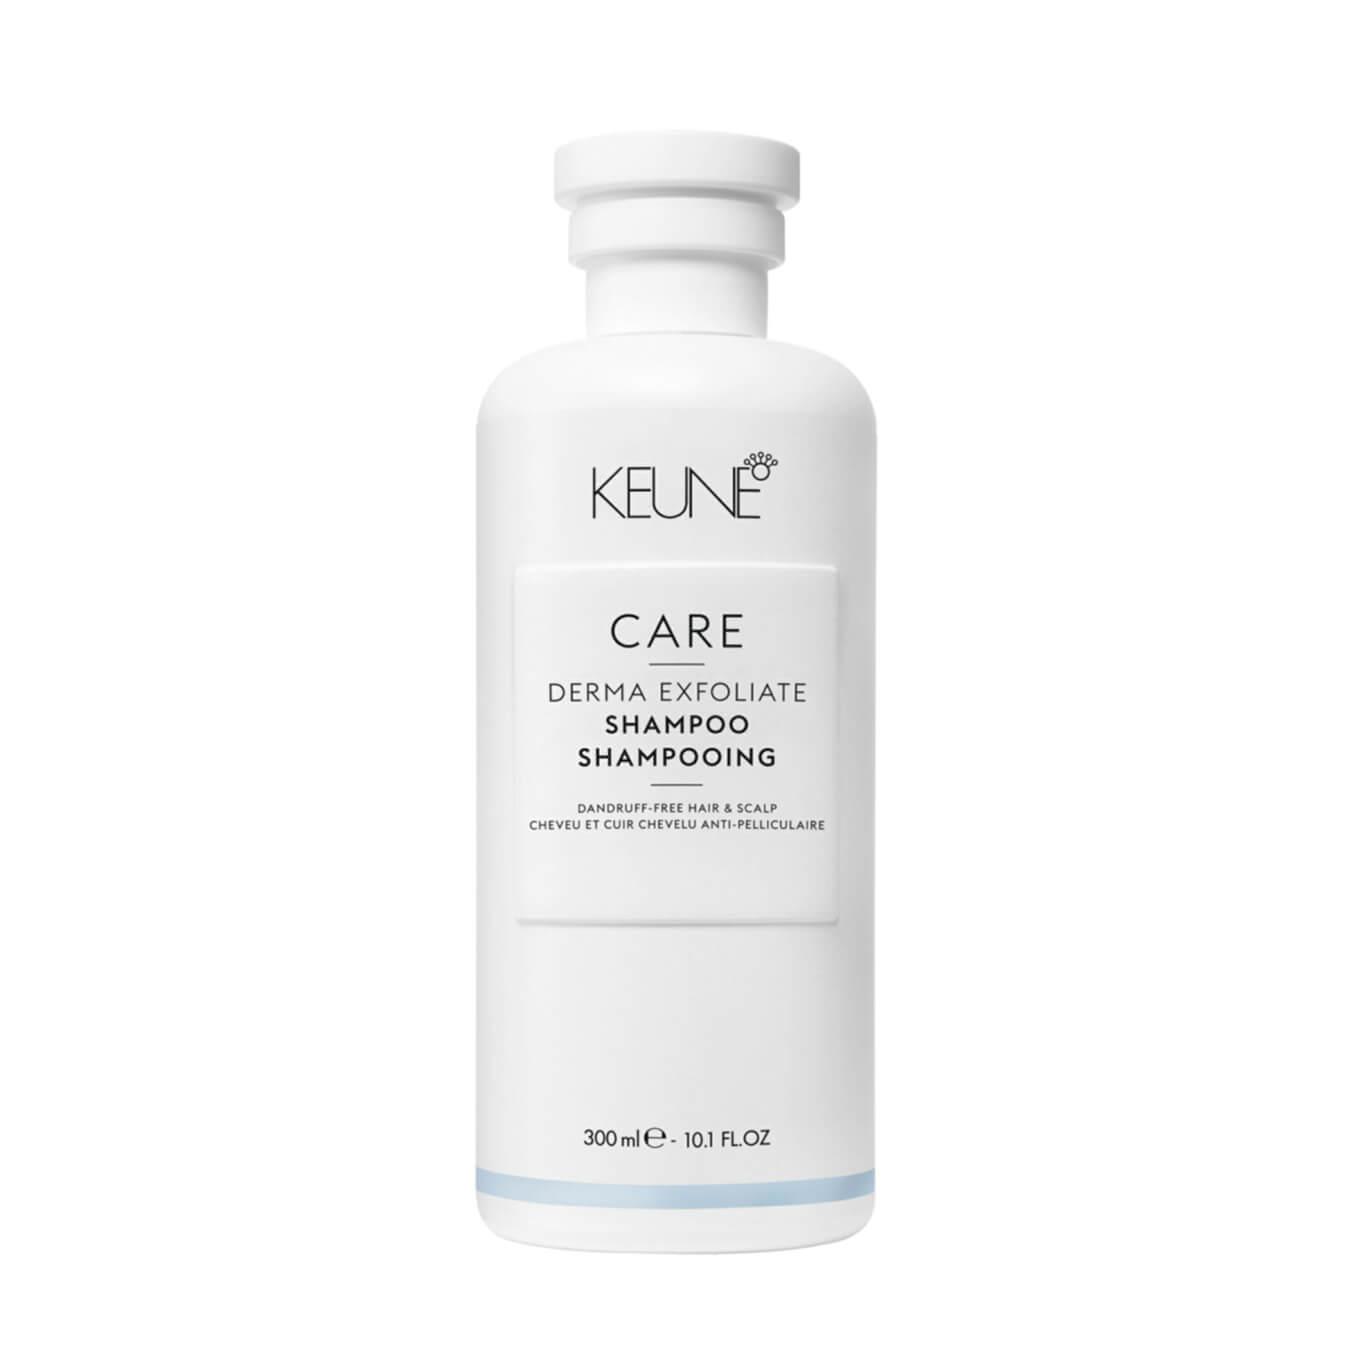 Kauf Keune Care Derma Exfoliate Shampoo 300ml